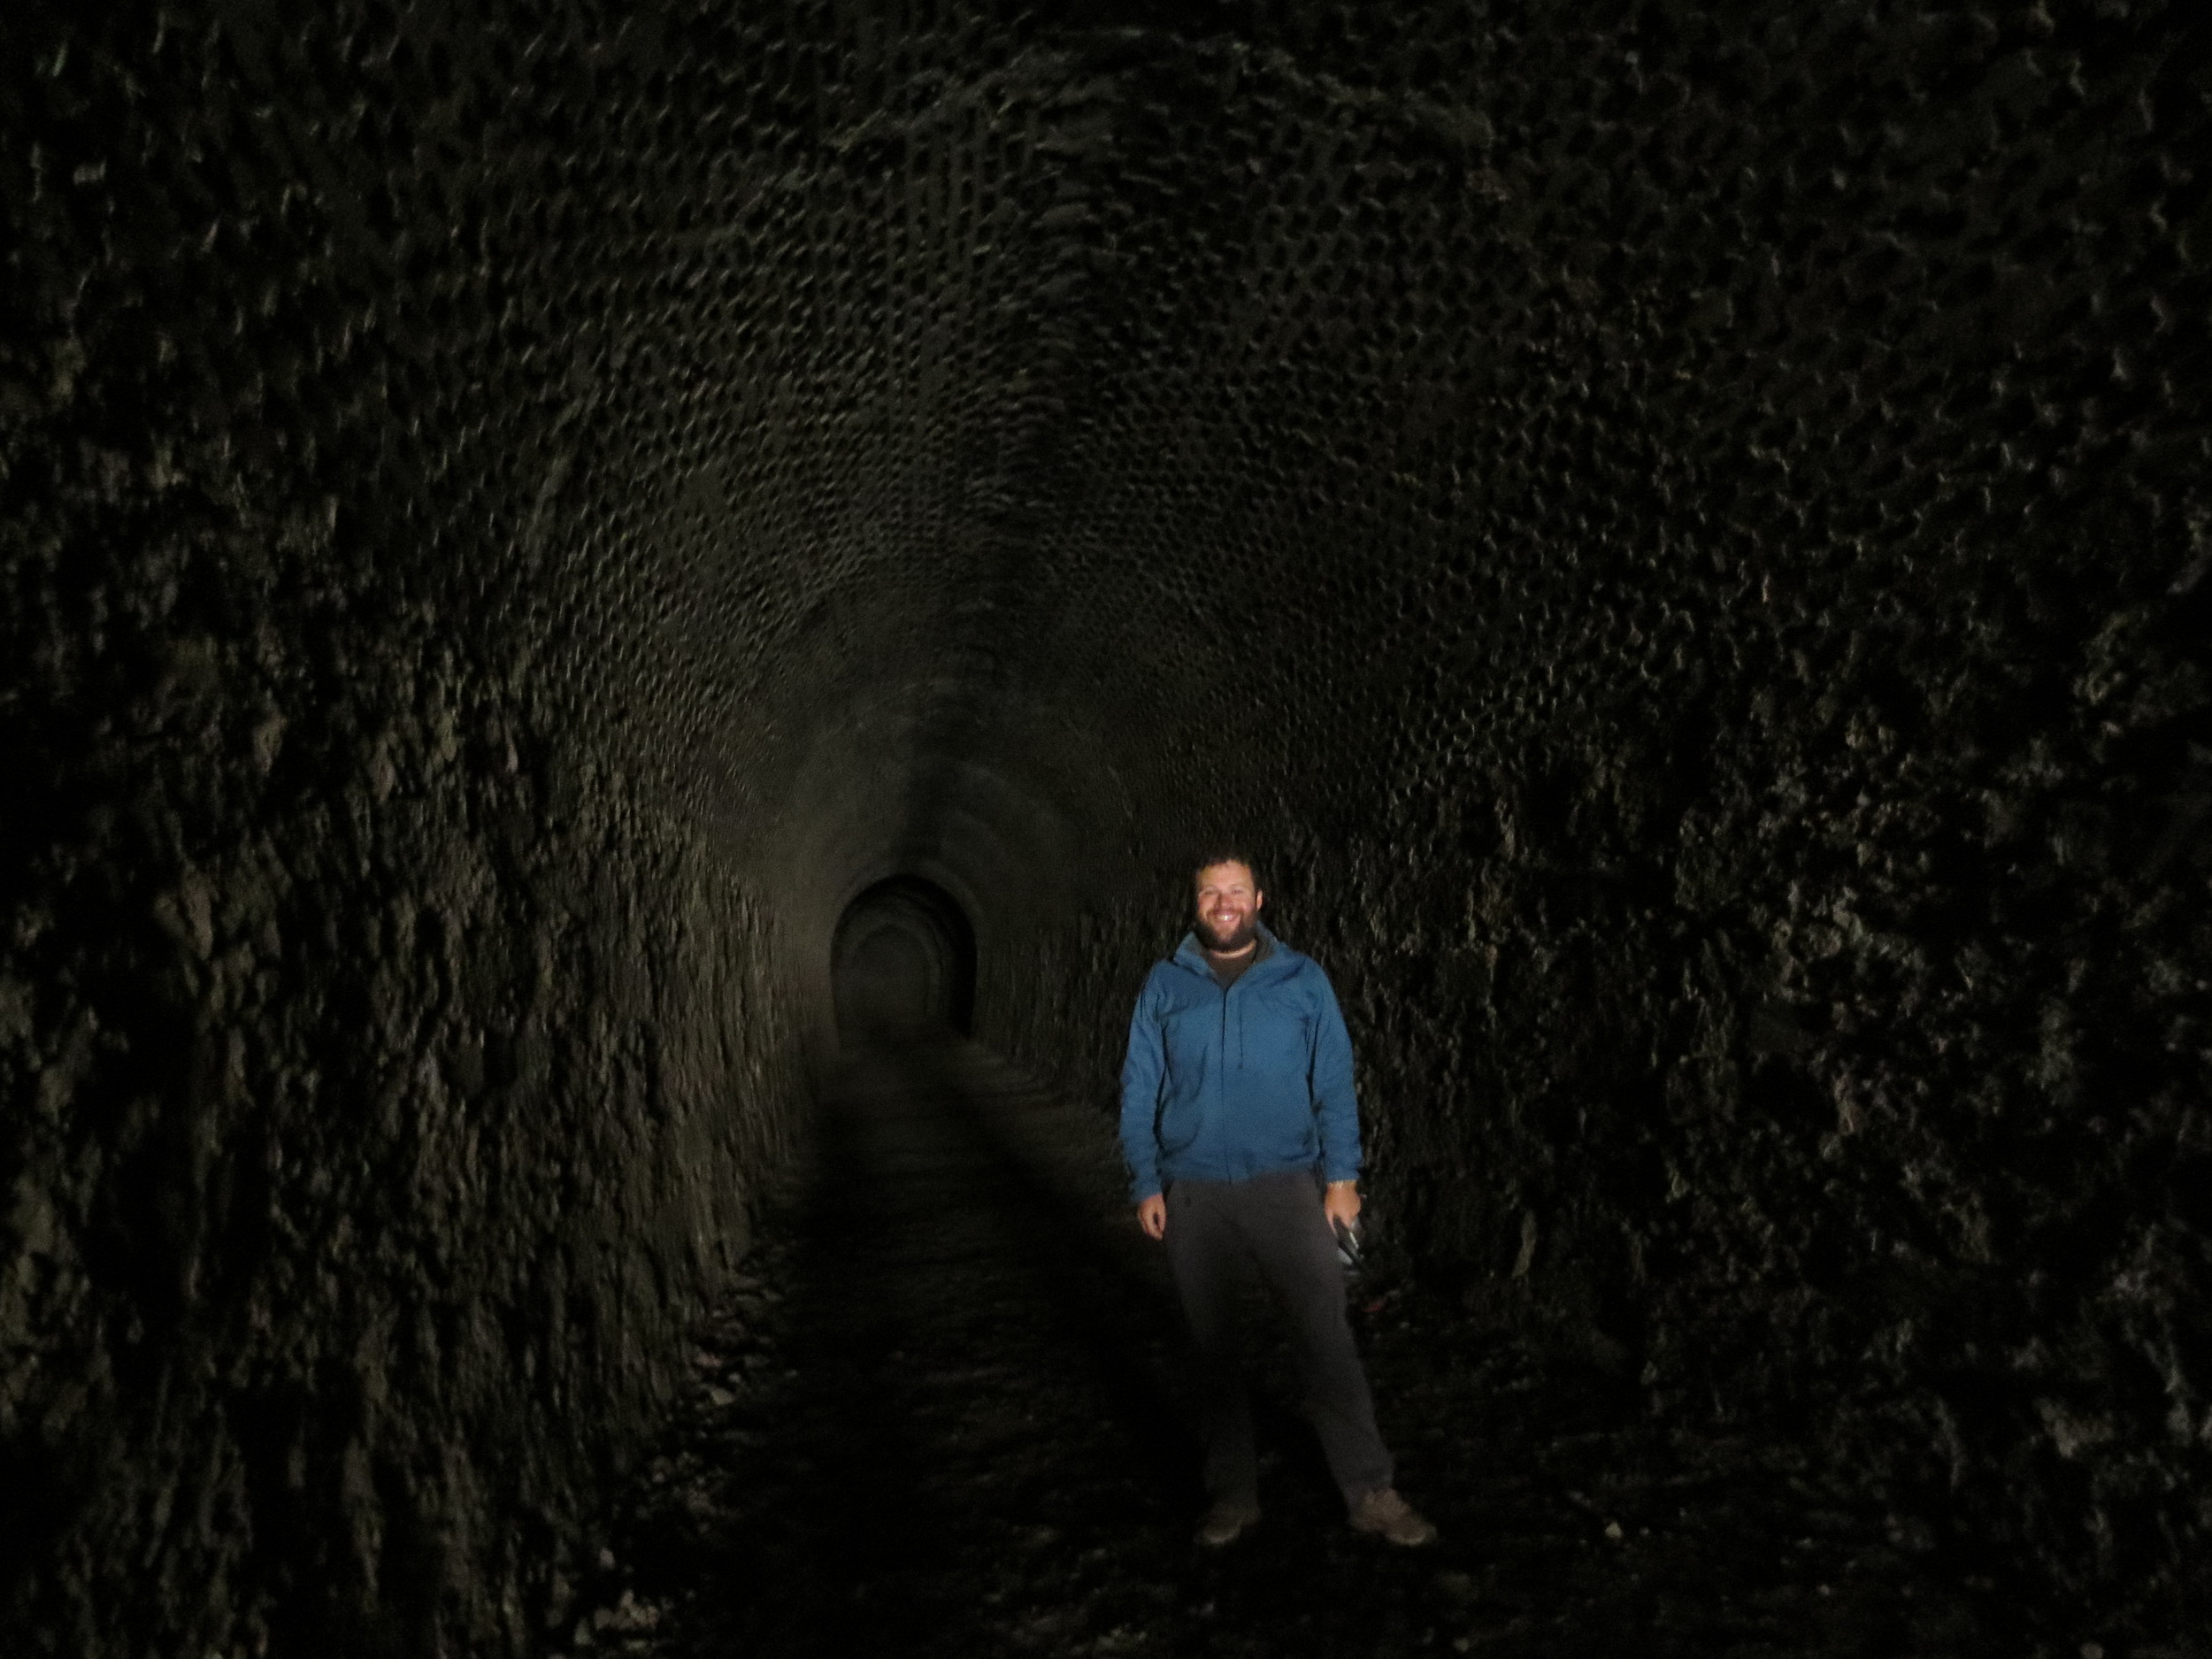 Otago Rail Trail Tunnel #3 - New Zealand